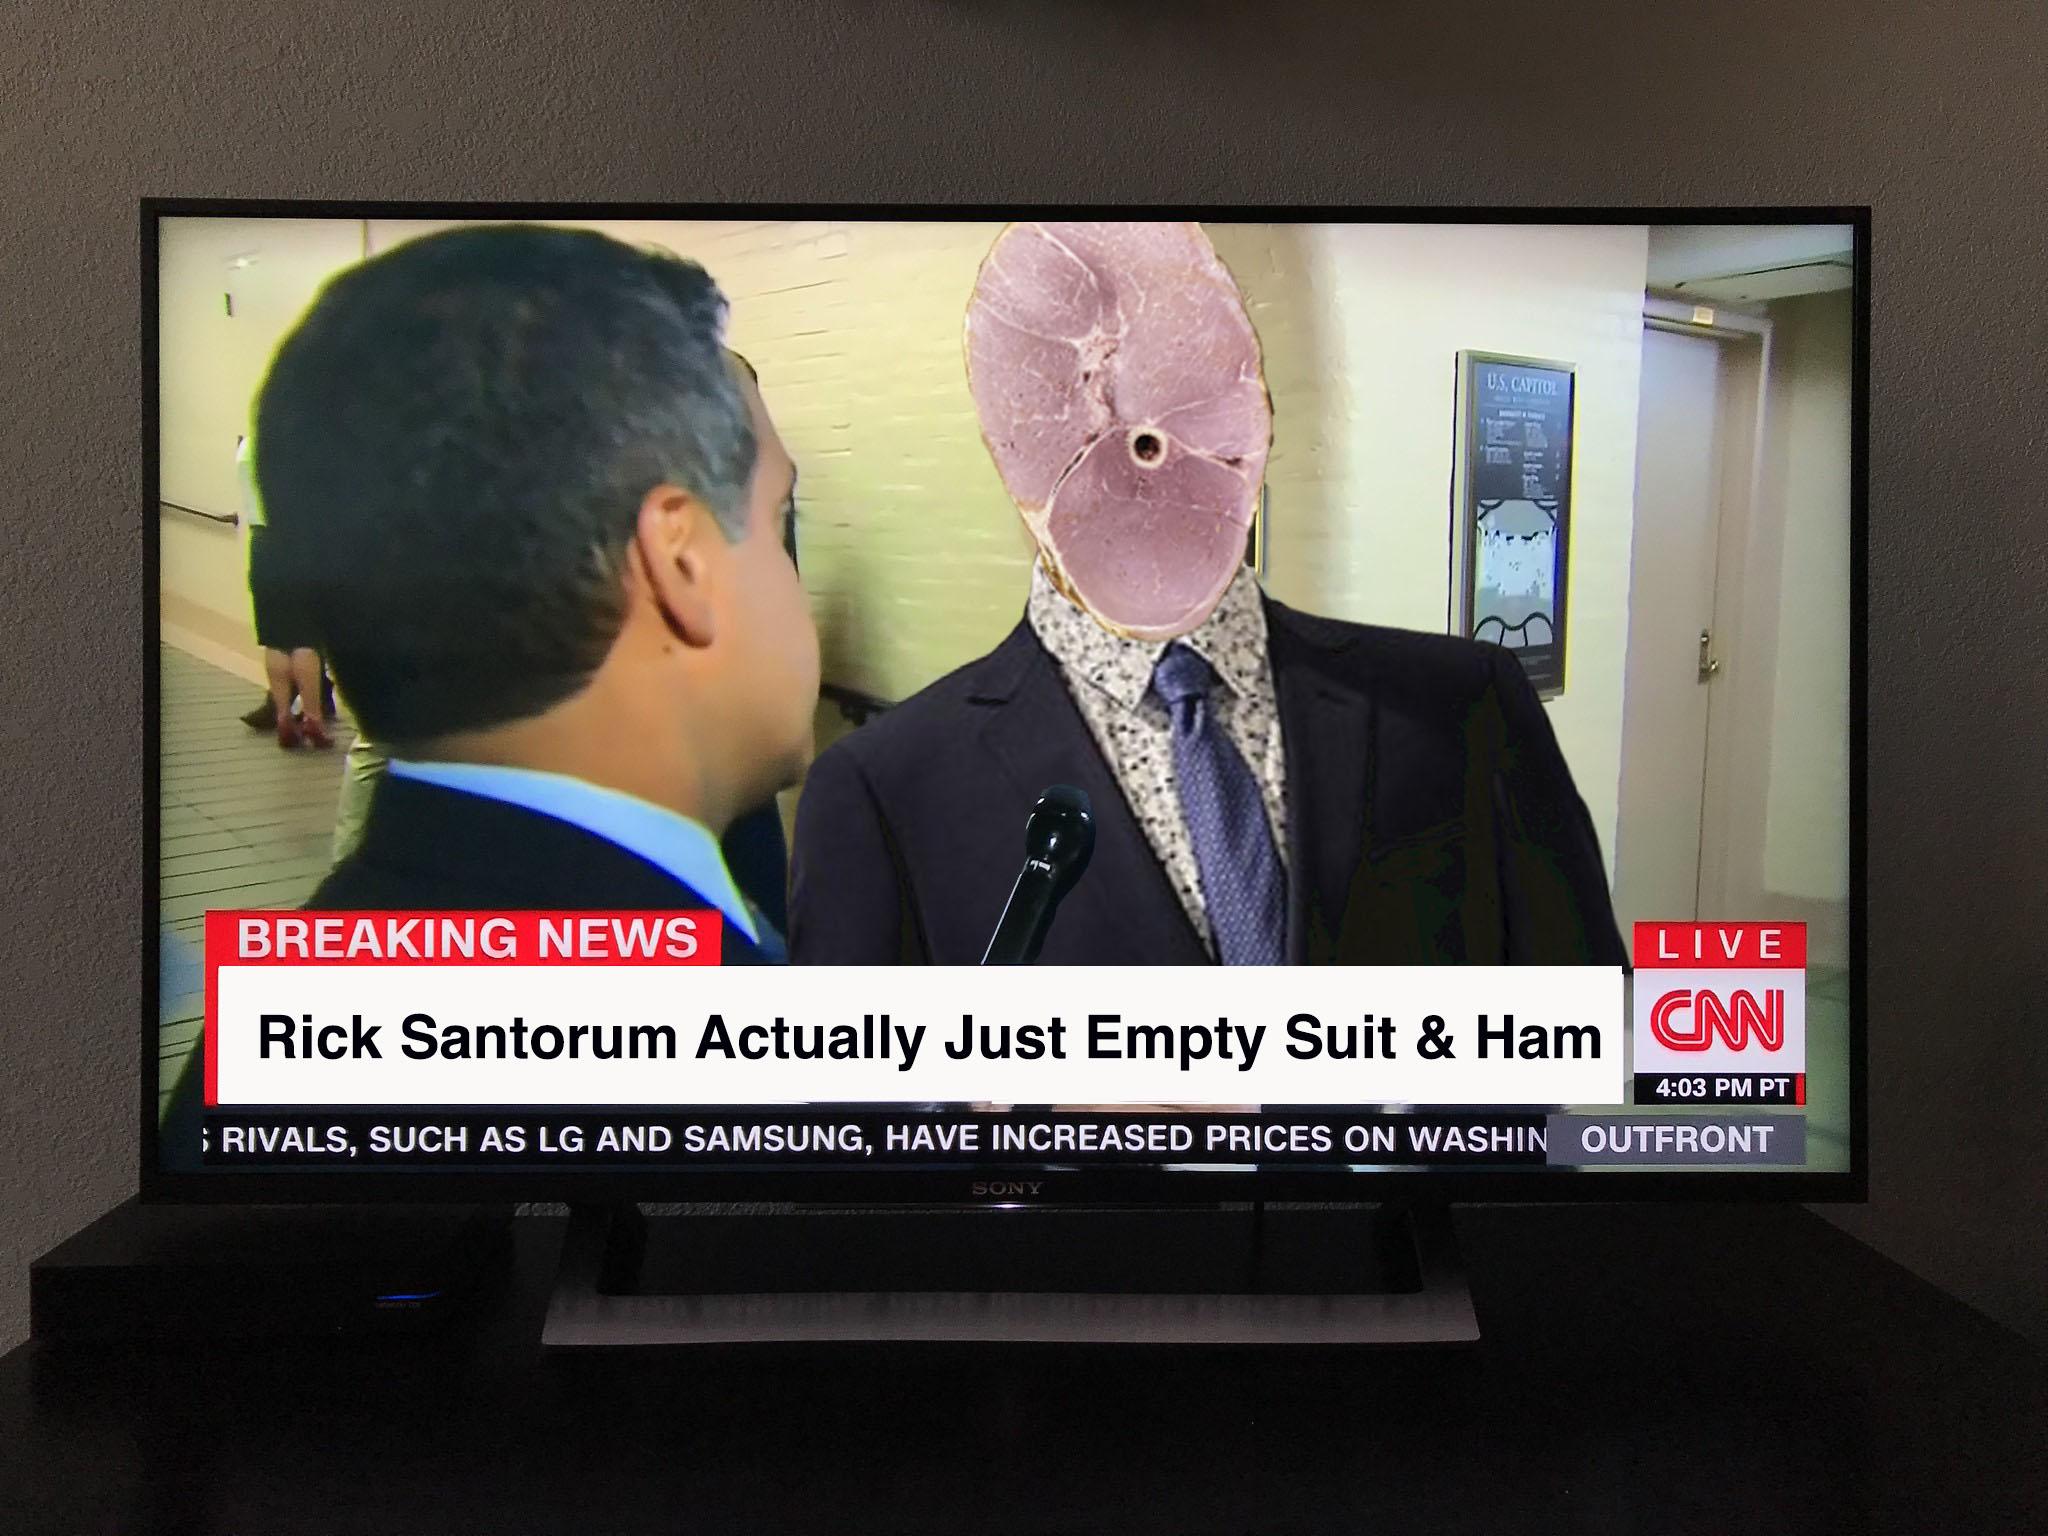 rick-santorum-just-empty-suit-and-half-baked-ham